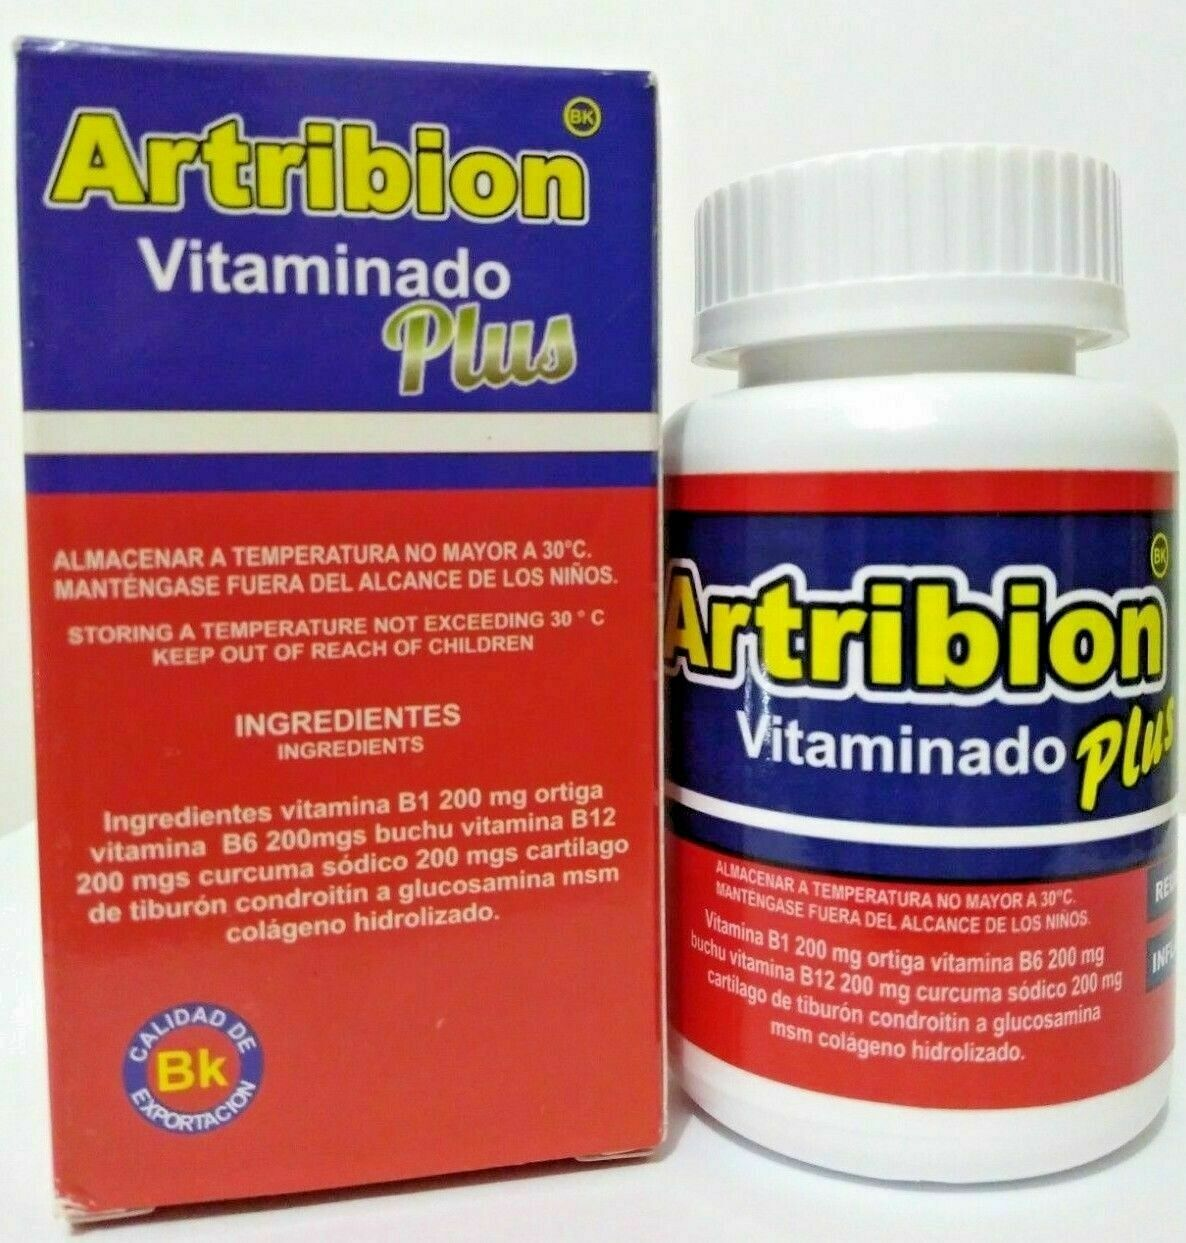 ARTRIBION Vitaminado Plus Artritis, Inflamacion, Dolor, Reumatismo, 30Capsules